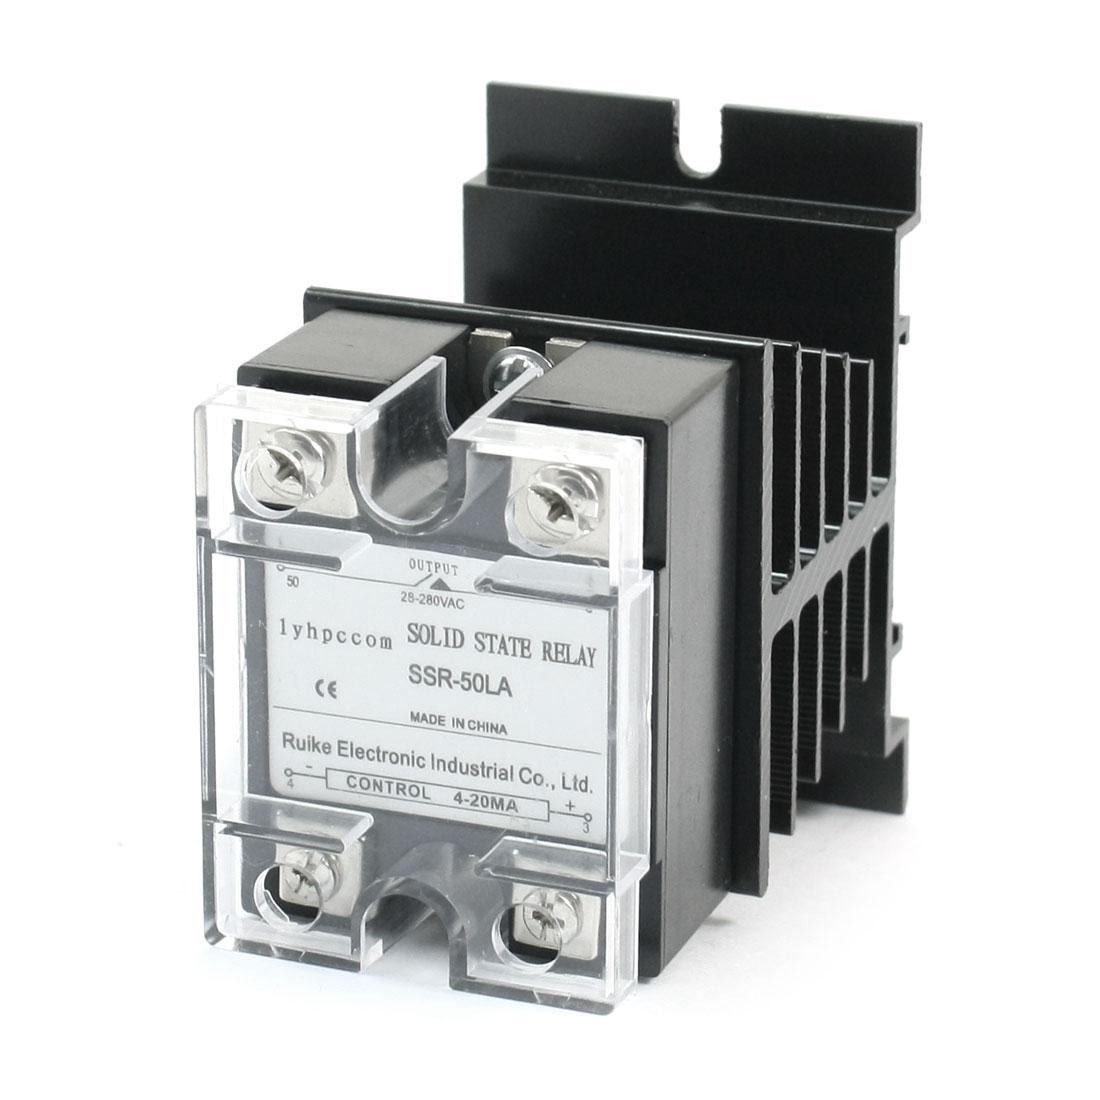 SSR-50LA 4-20mA to AC 28-280V 50A 4 Screw Terminal Single Phase Aluminum Heatsink SSR Solid State Relay w Cover